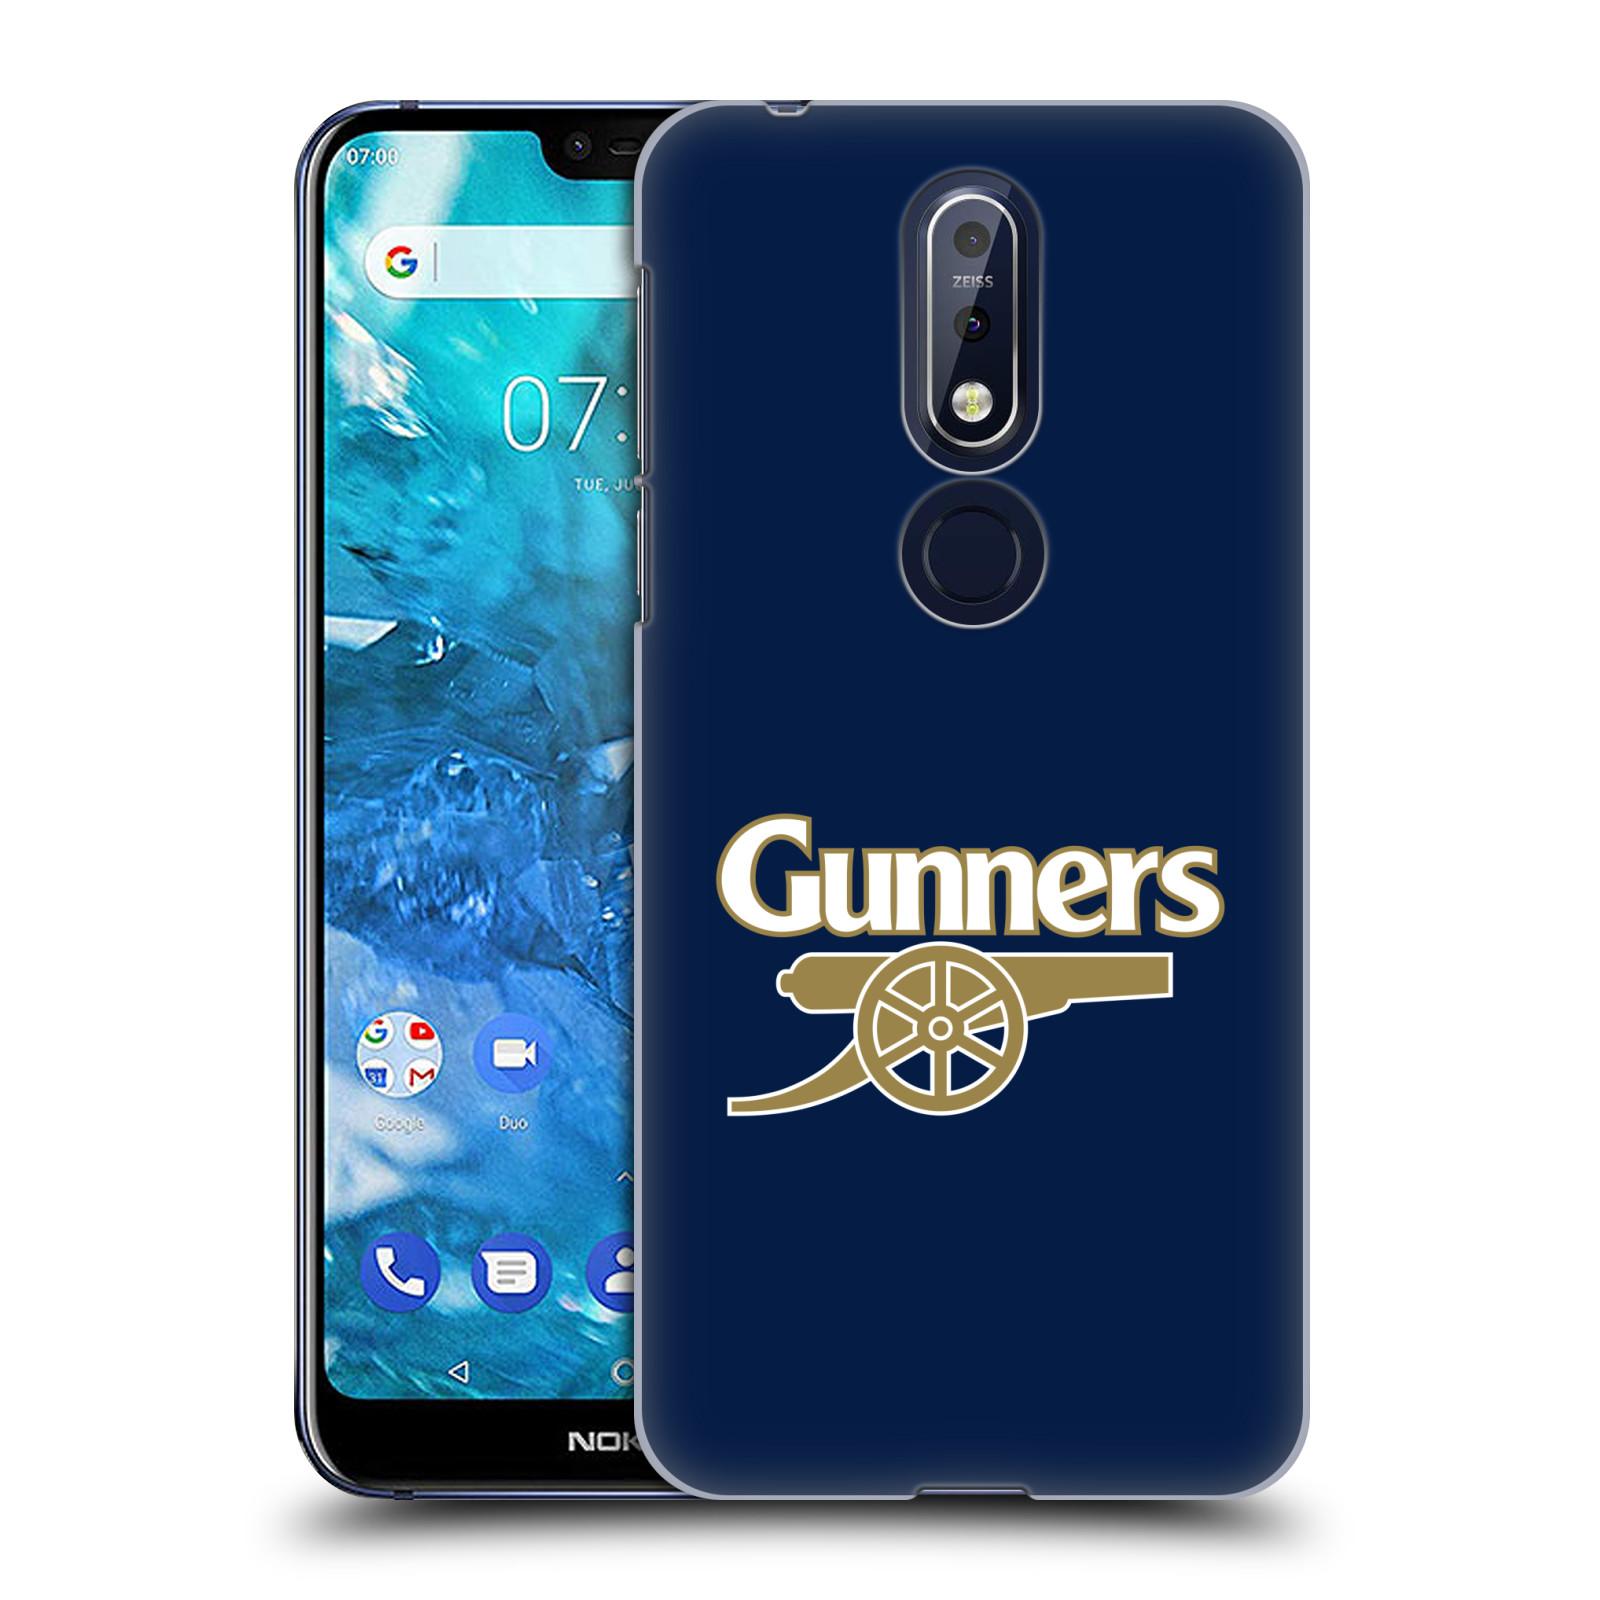 Plastové pouzdro na mobil Nokia 7.1 - Head Case - Arsenal FC - Gunners